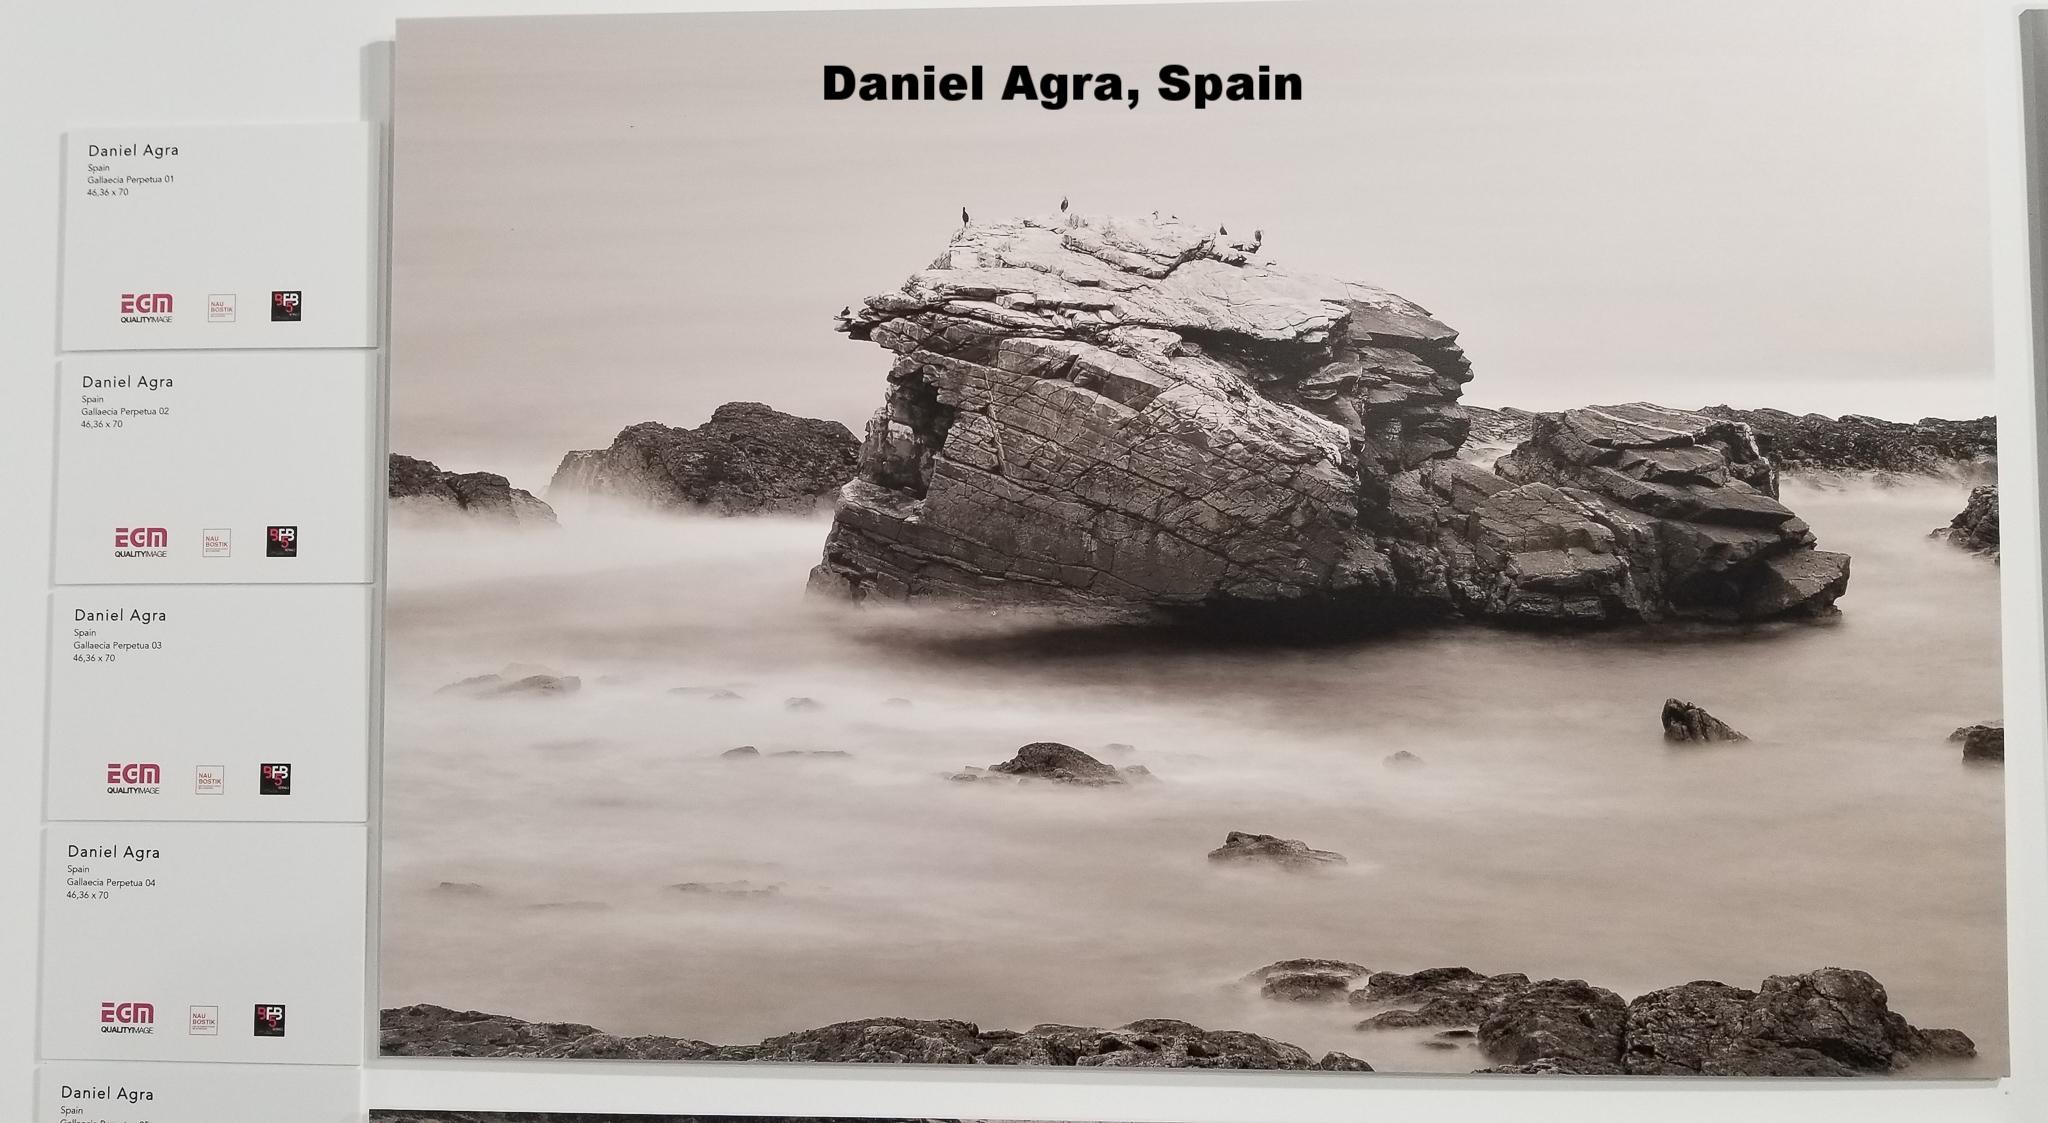 Daniel Agra, Spain